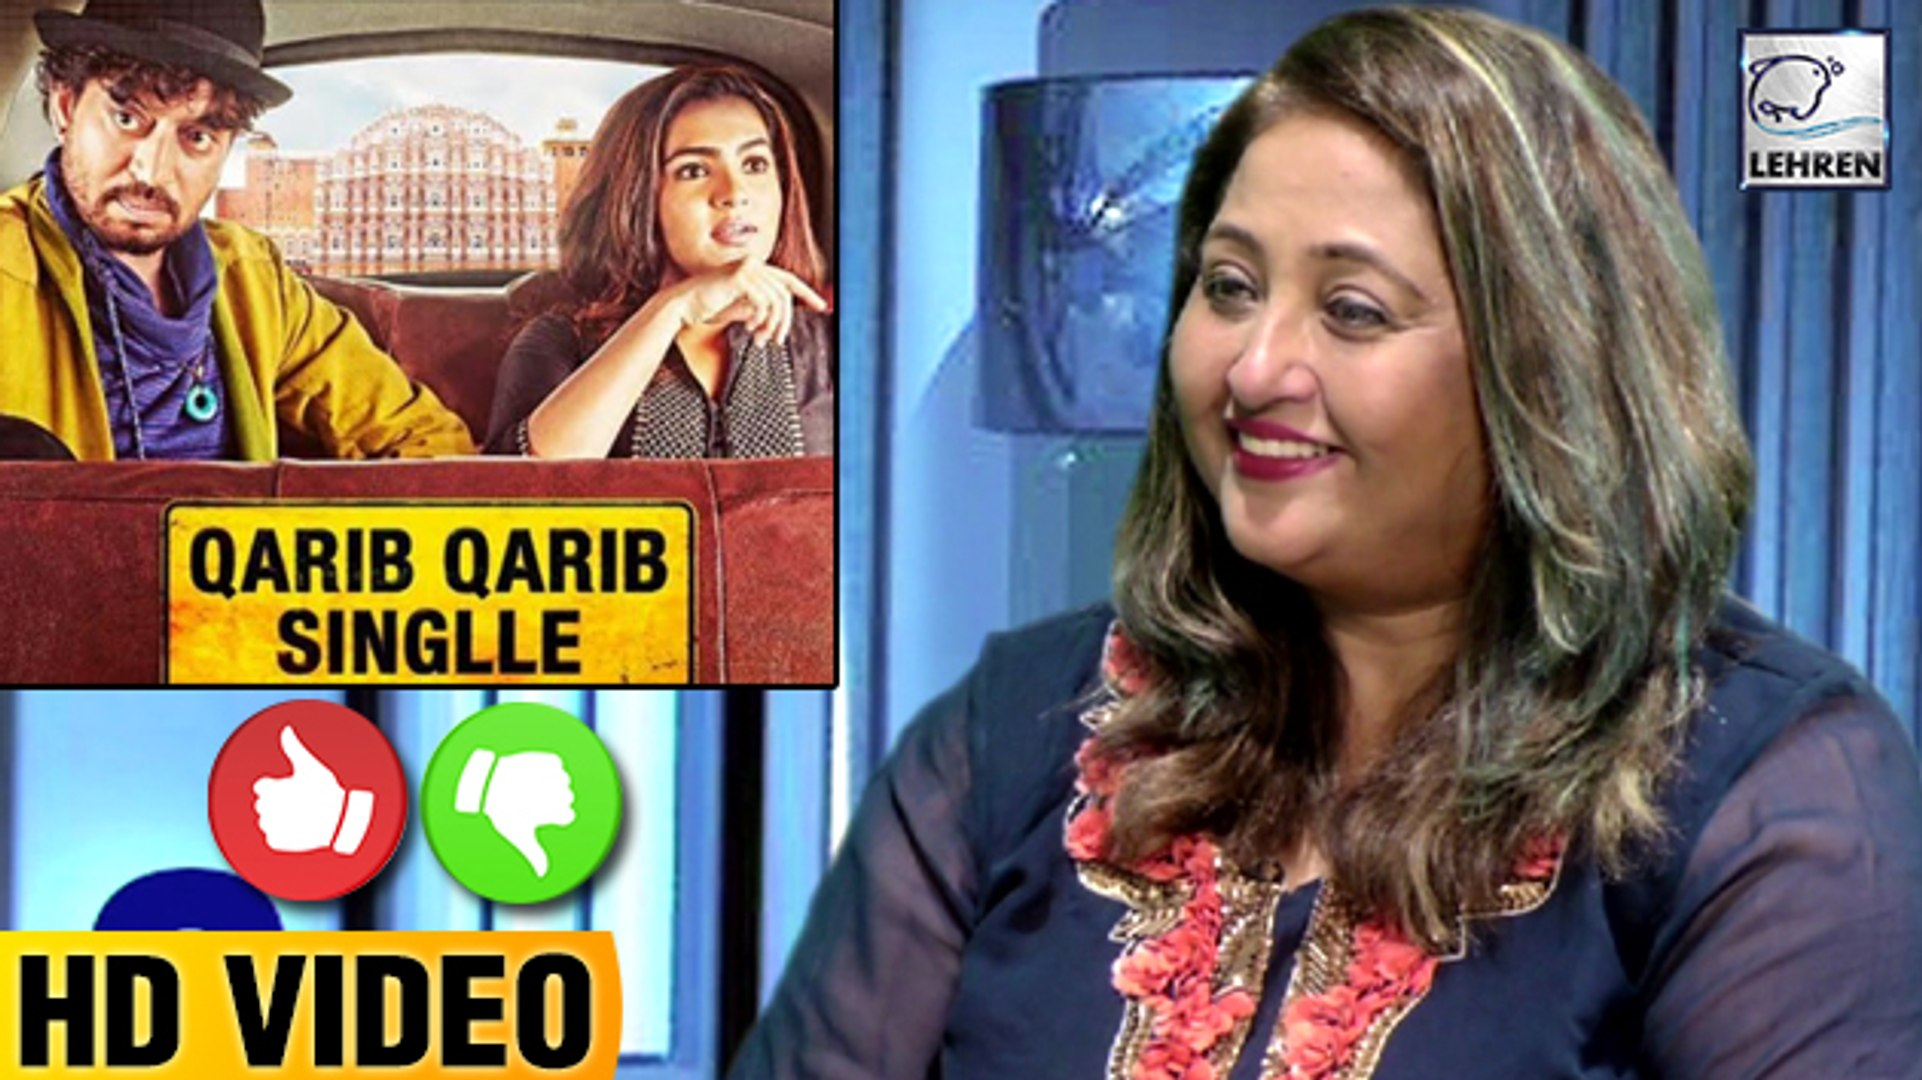 Swetta Jumani's Prediction For Qarib Qarib Singlle, HIT OR NOT? | The  Jumani Show